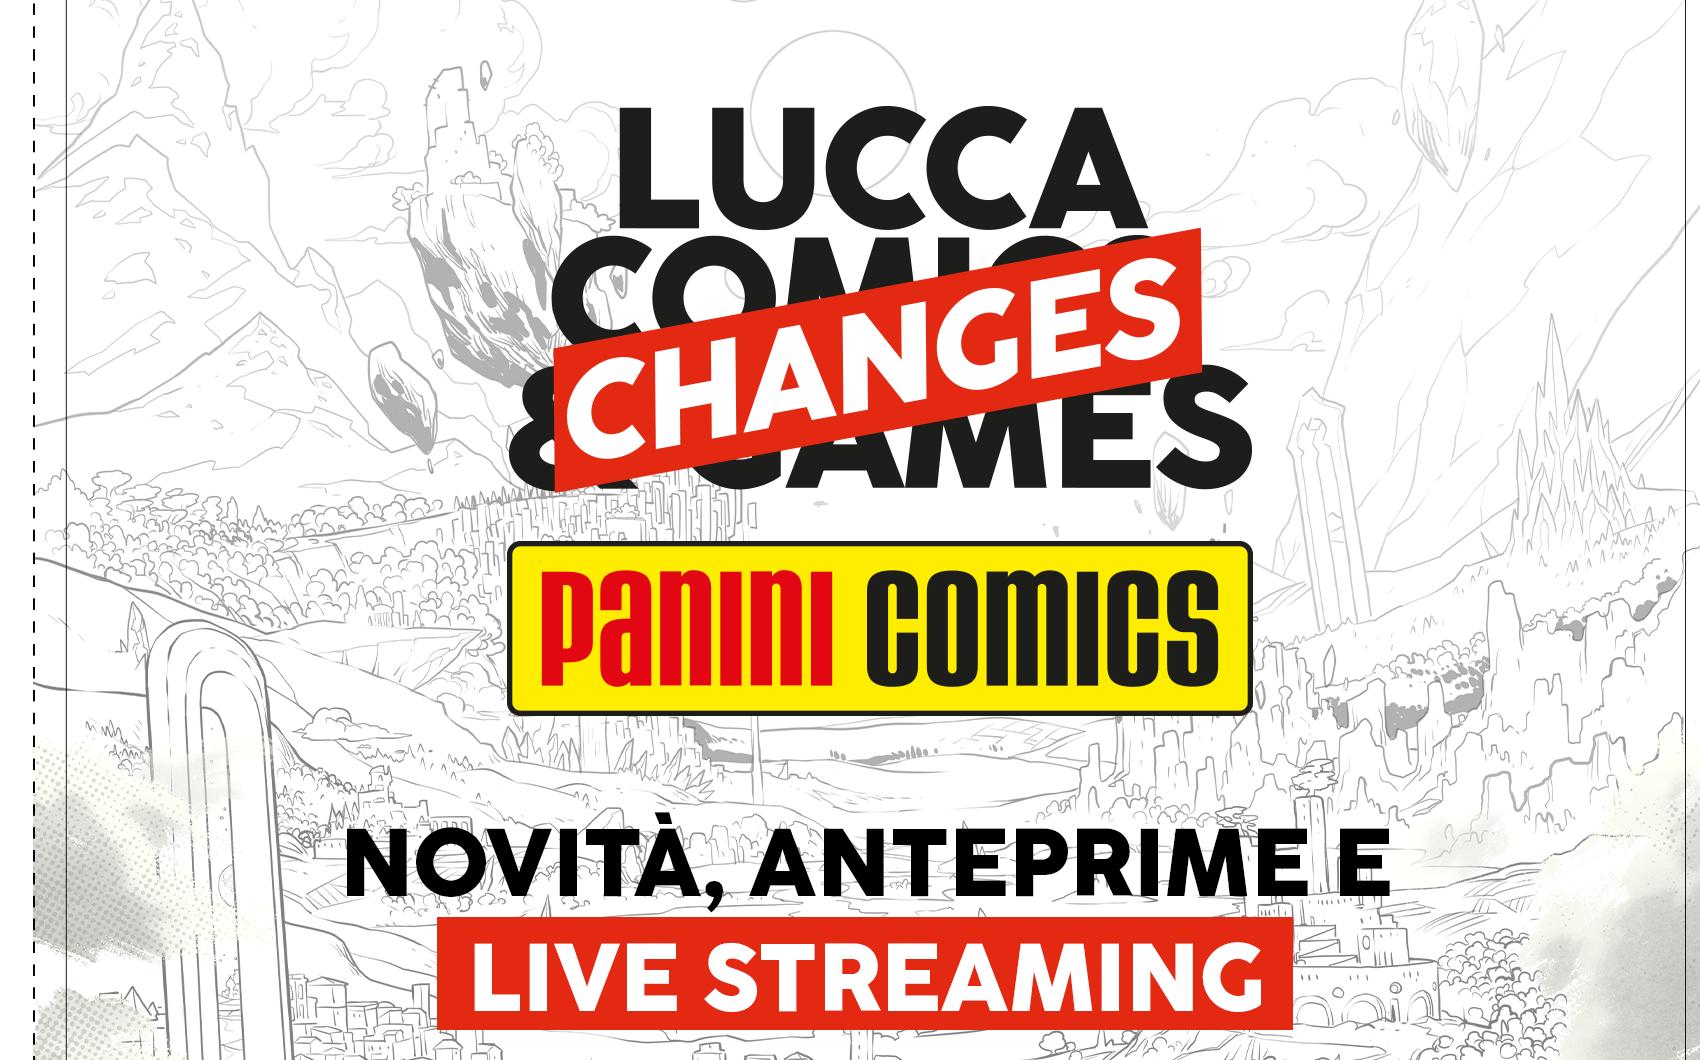 Panini Comics – Annunciati gli appuntamenti per Lucca Changes